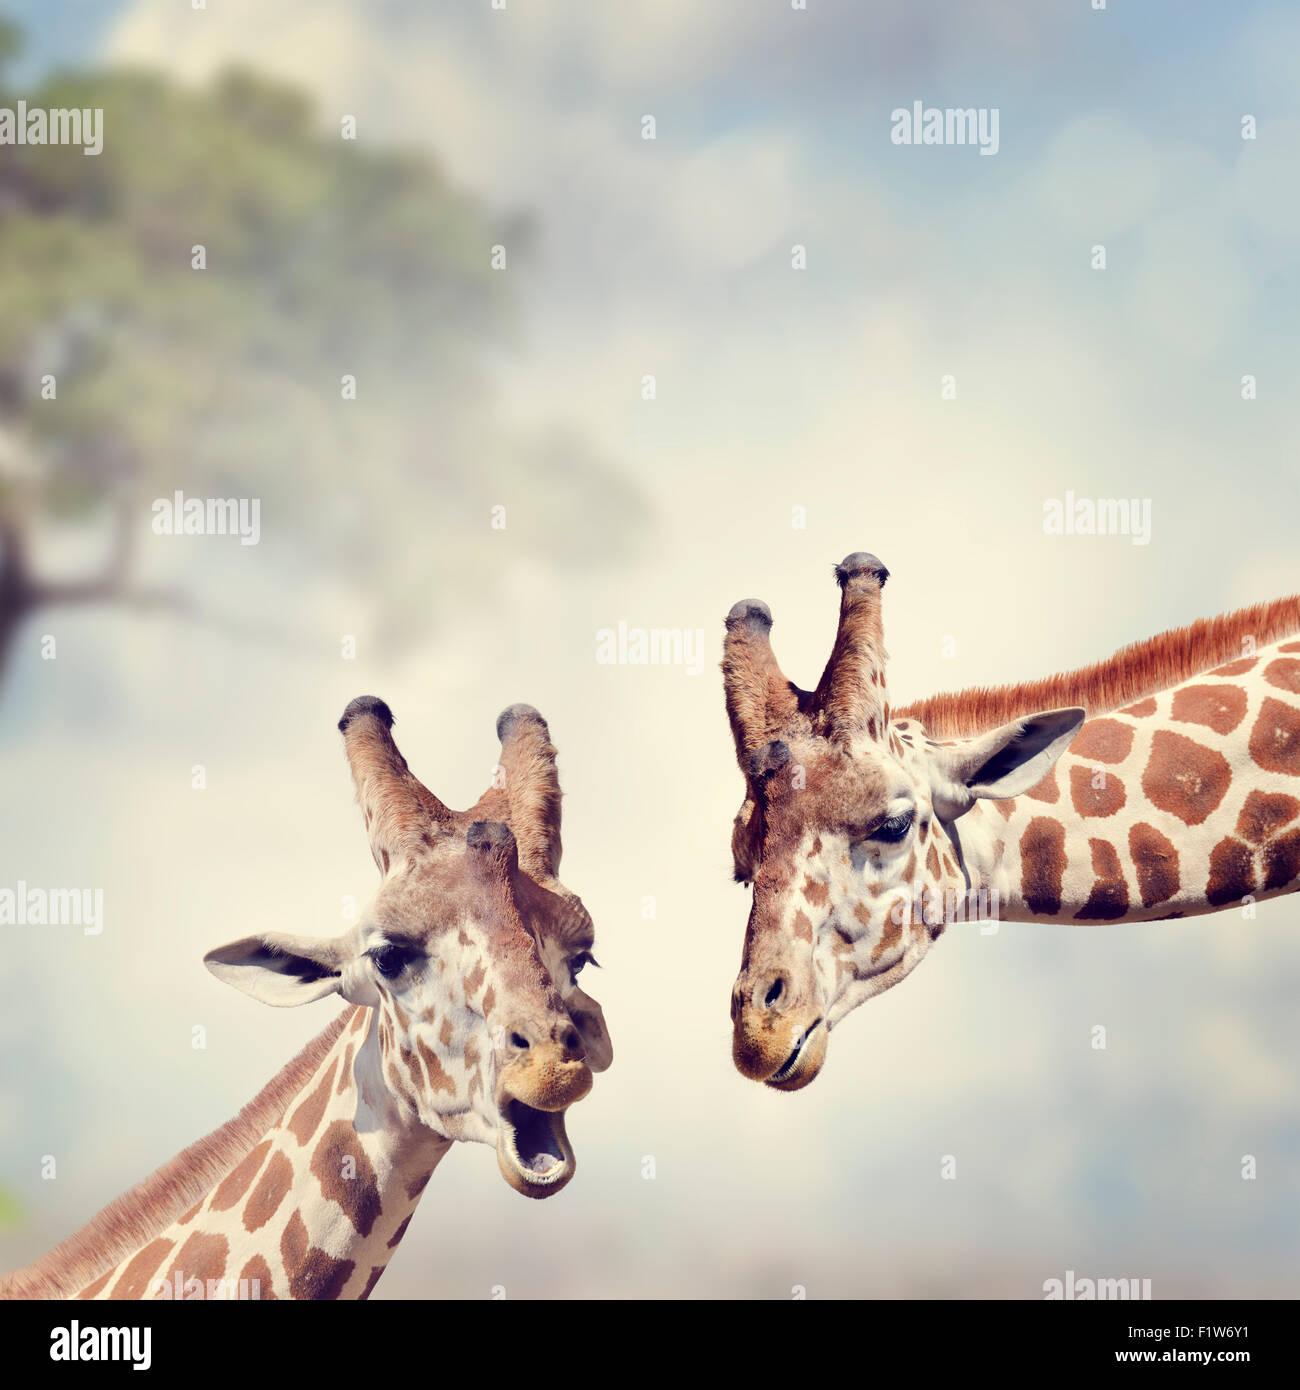 Foto di due adulti giraffe Immagini Stock